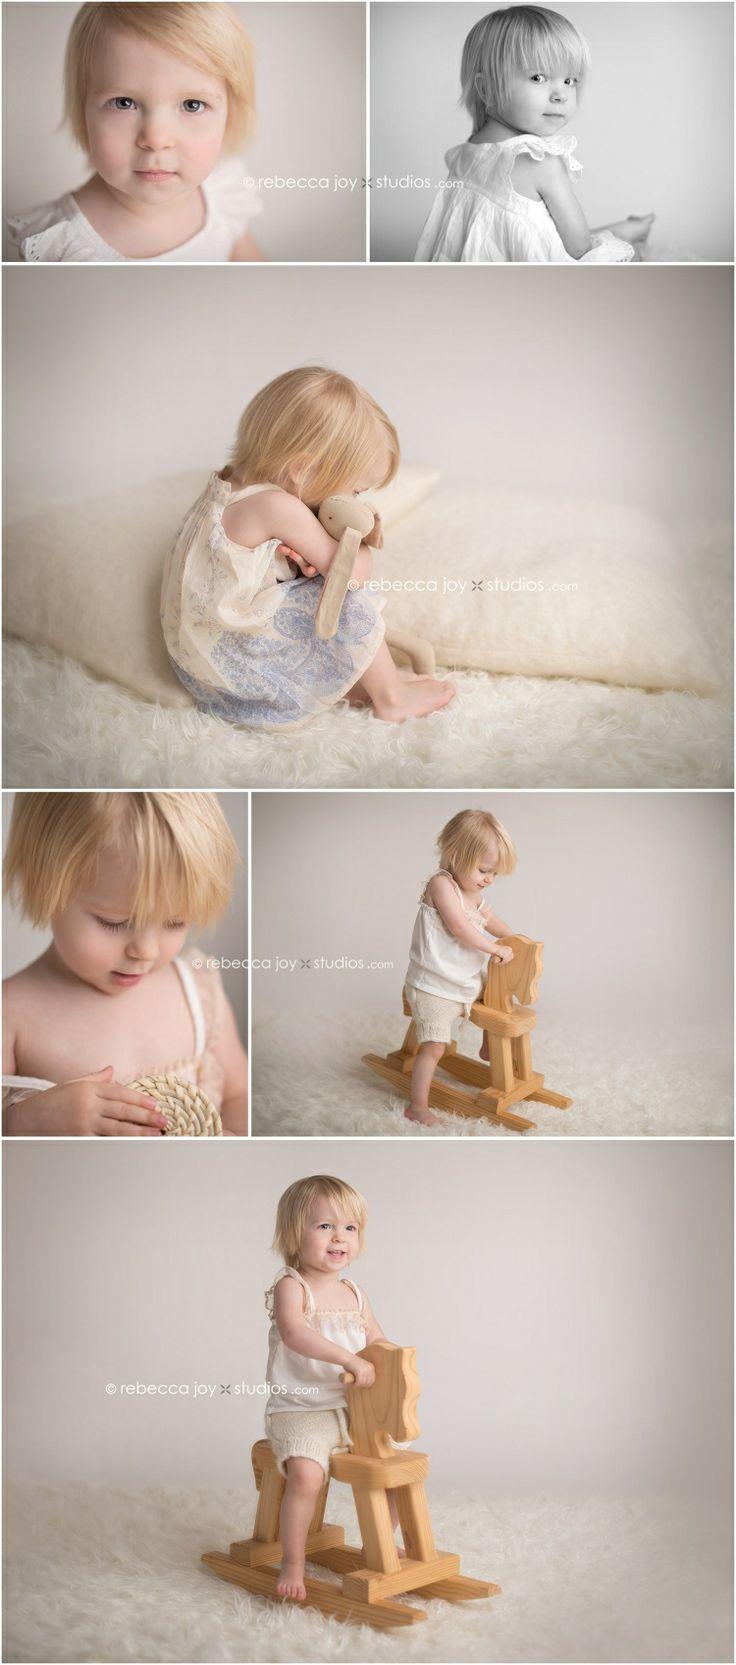 Rebecca Joy Studios | Photography | Victoria BC Child Photographer